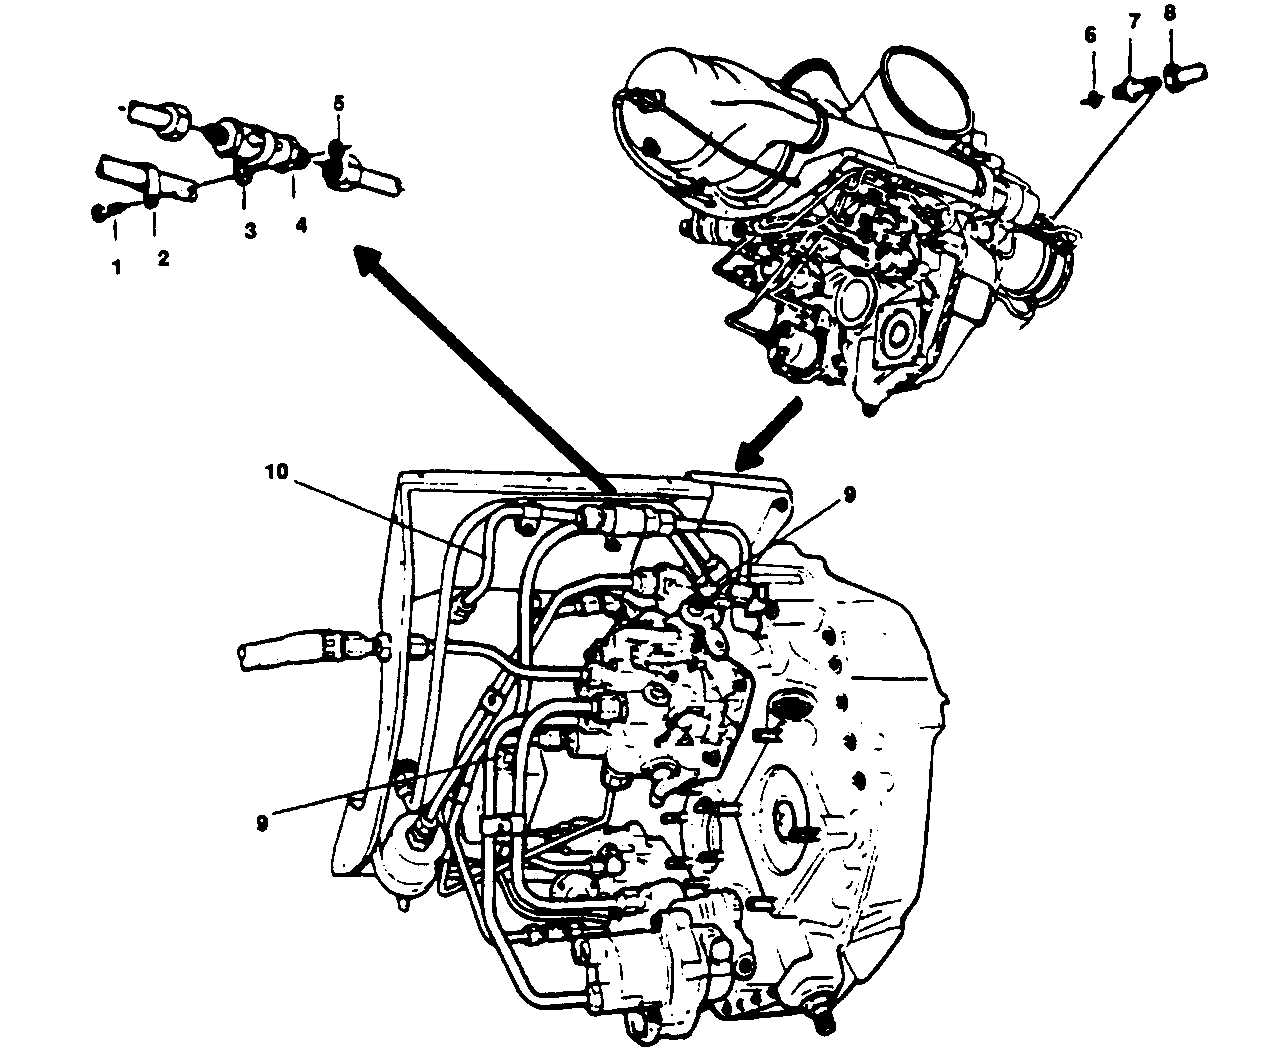 Figure 5-12. External Oil Check Valve